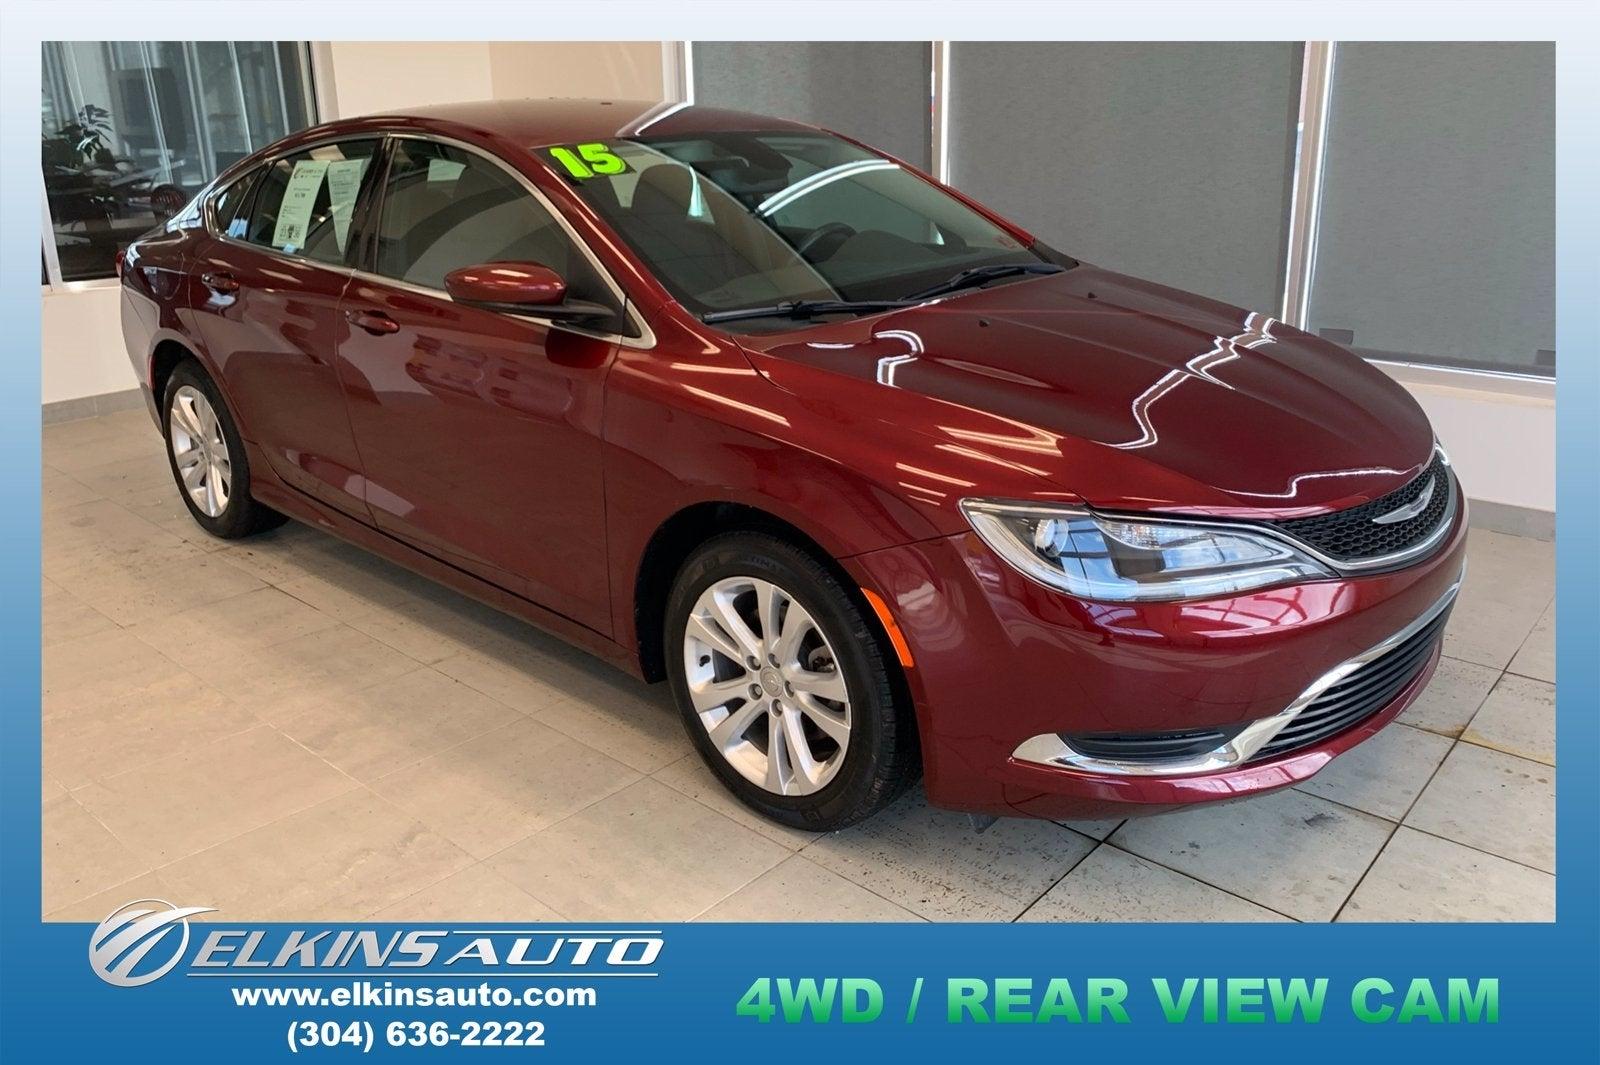 2015 Chrysler 200 Limited Red >> 2015 Chrysler 200 Limited